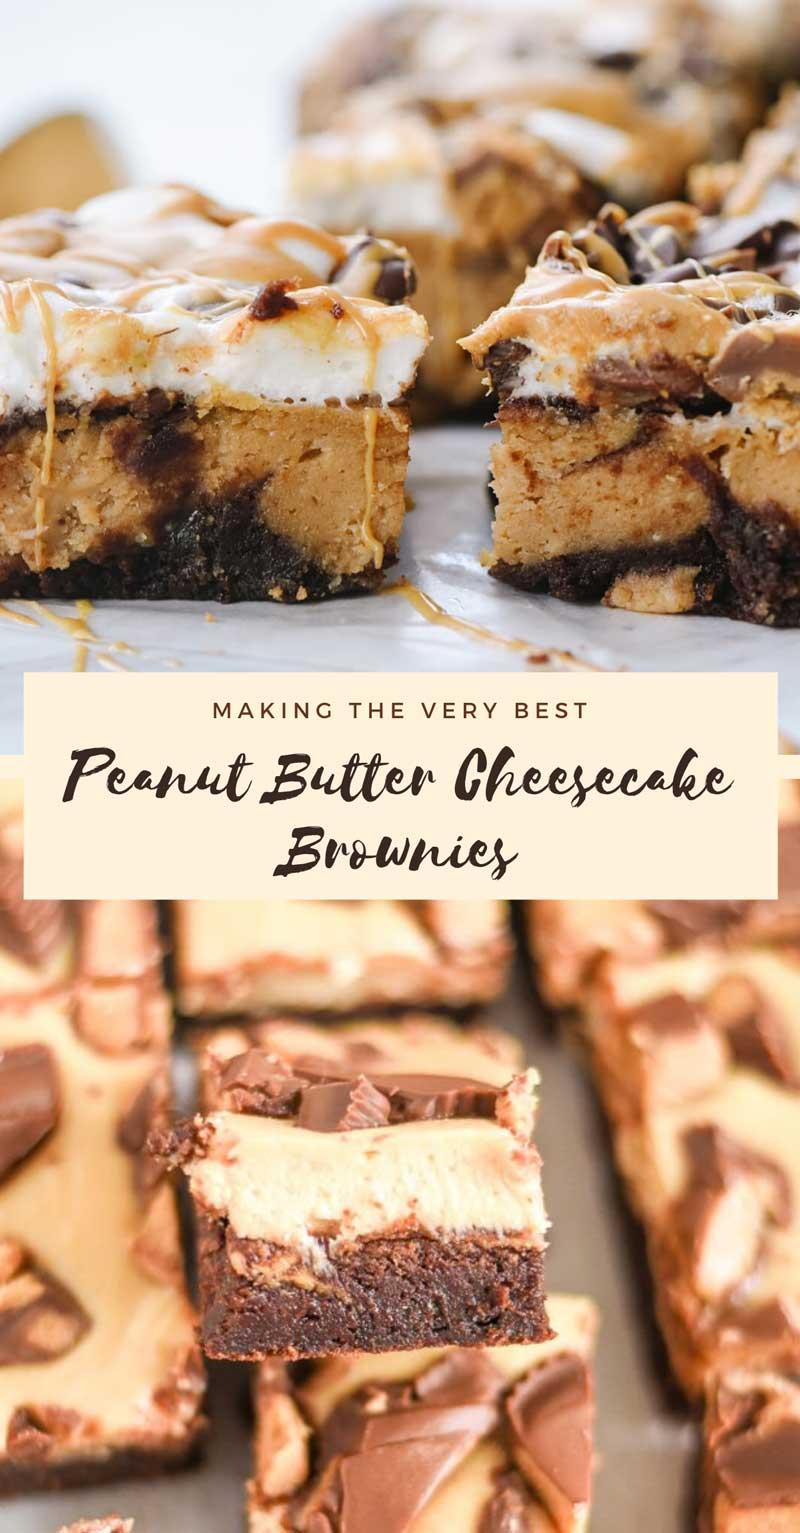 Peanut Butter Cheesecake Brownies Recipes Ideas Pinterest